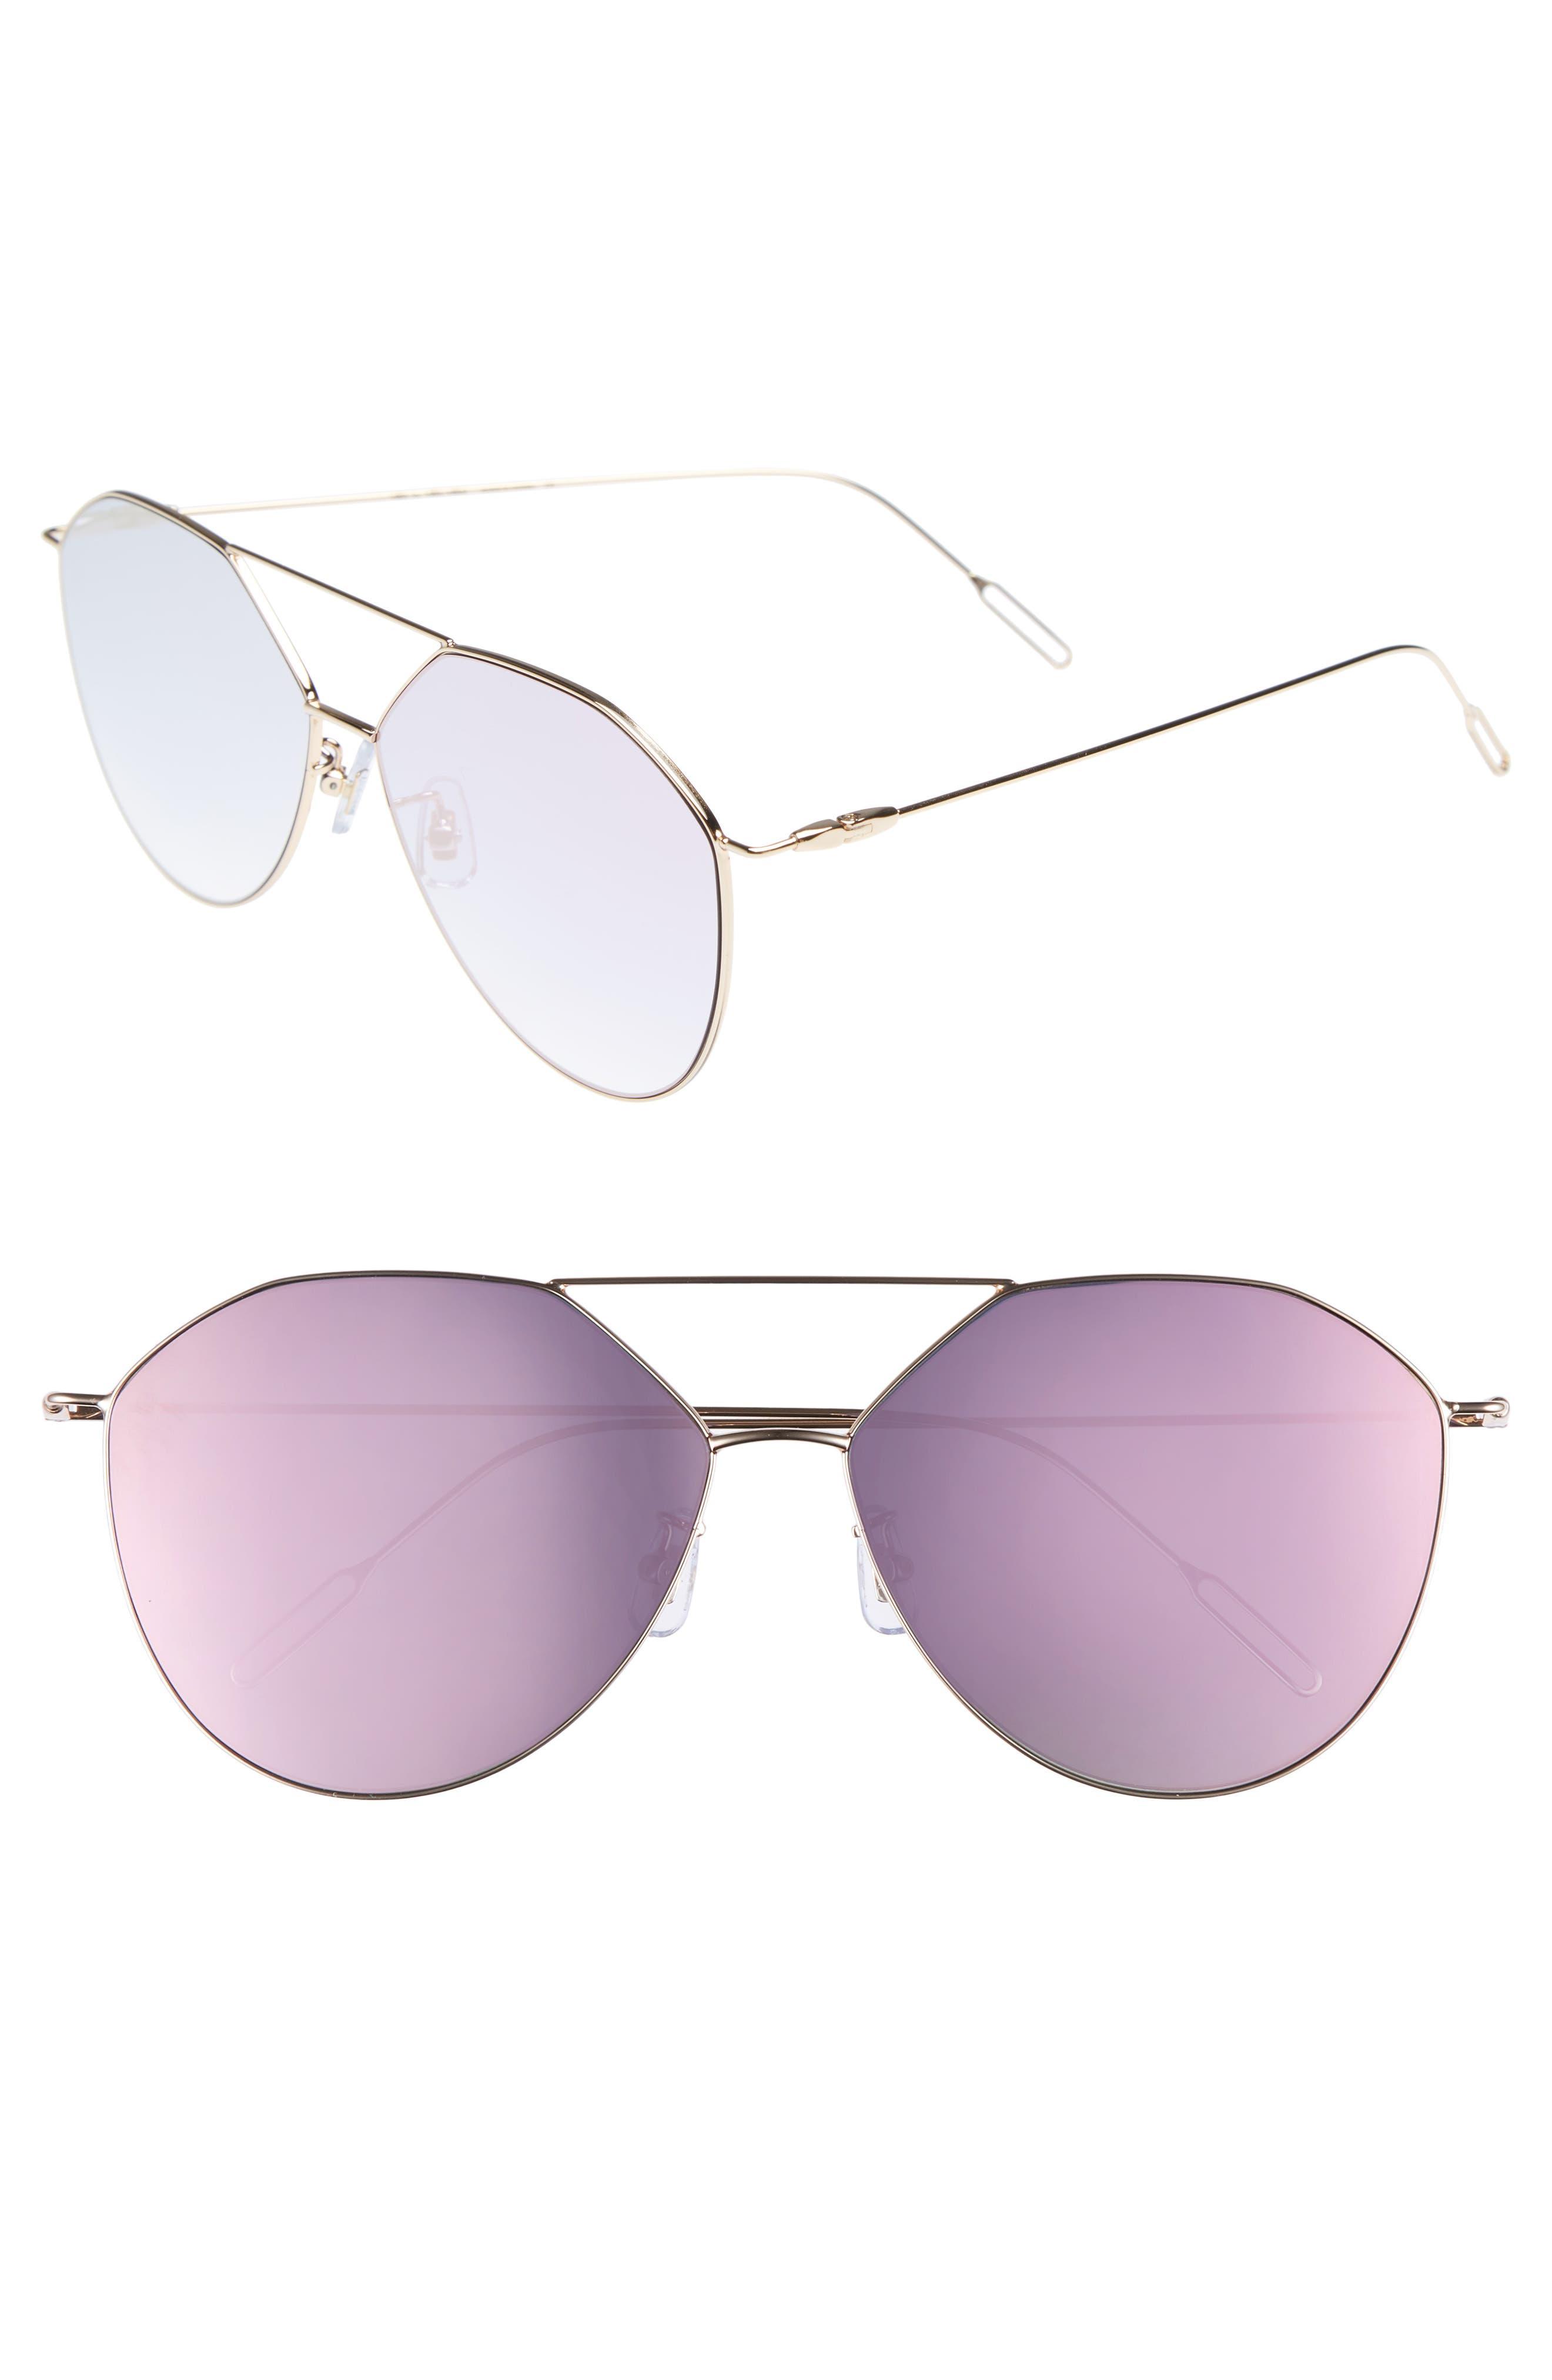 55mm Metal Aviator Sunglasses,                             Main thumbnail 1, color,                             GOLD /PINK MIRROR